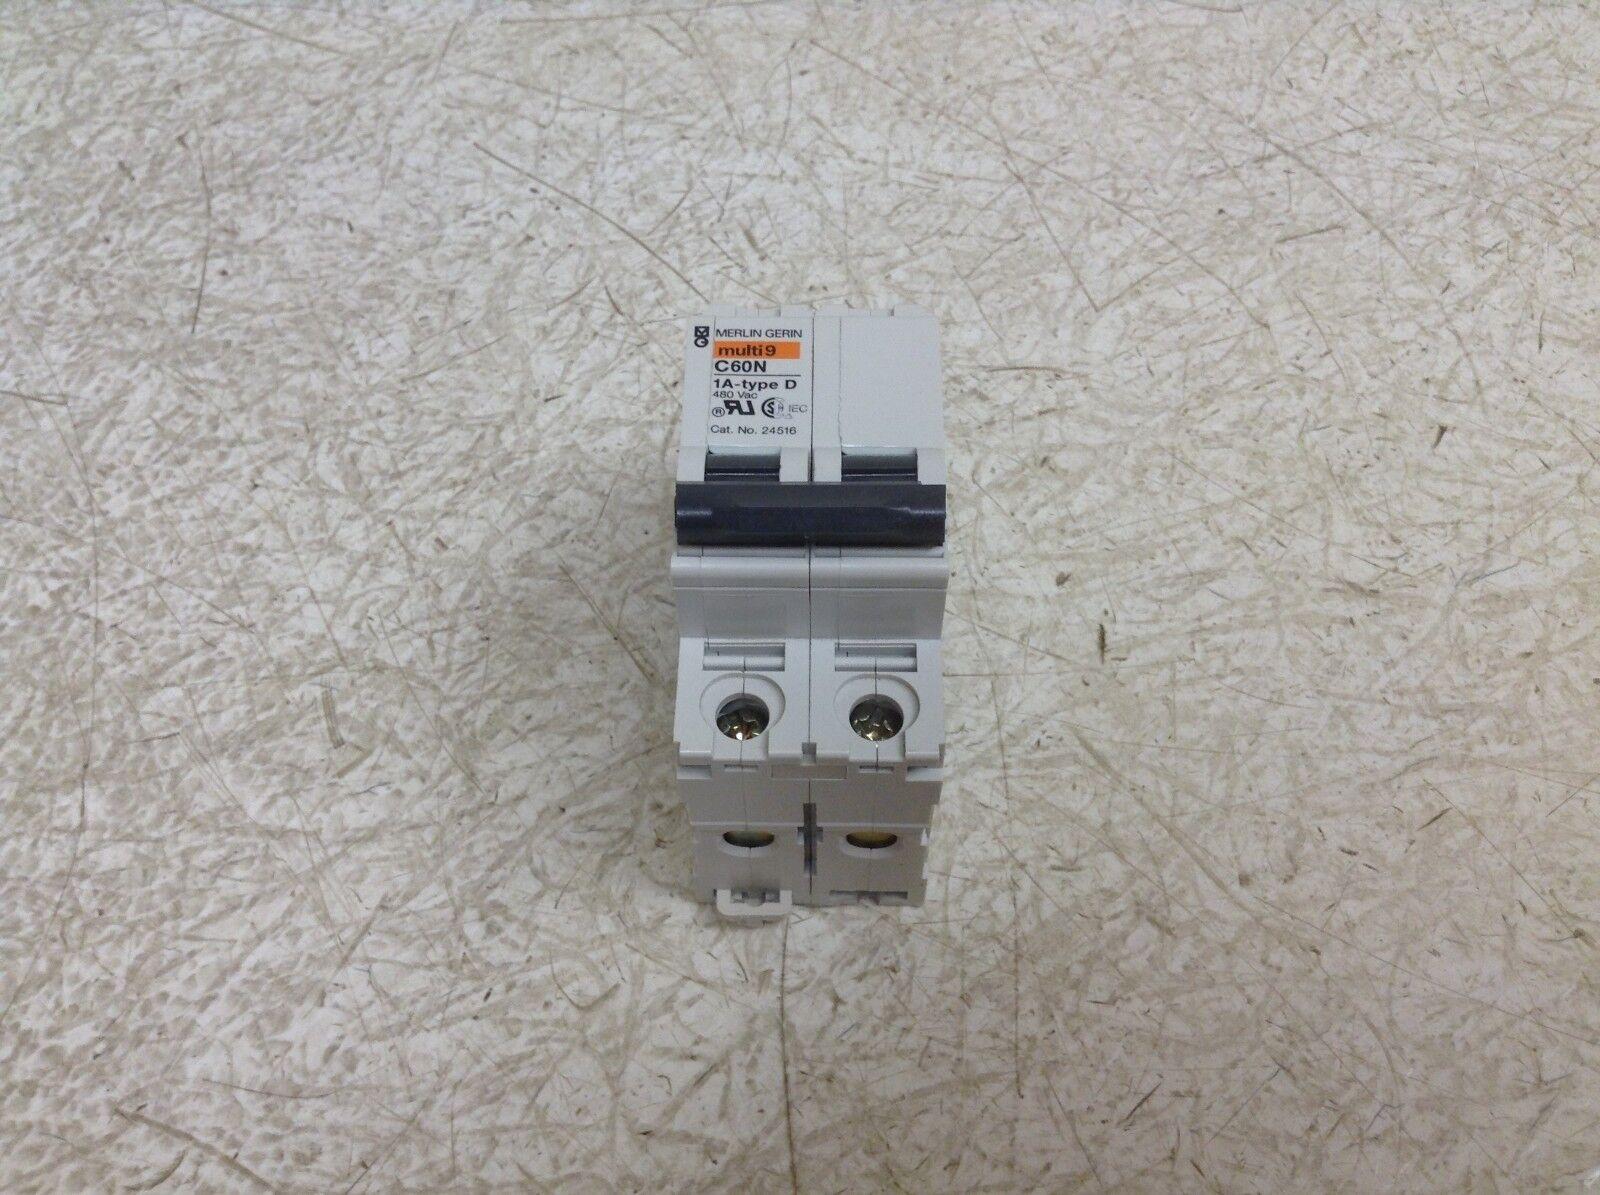 Merlin Gerin D 1a Multi 9 C60 Circuit Breaker 24516 1 Amp 2 Pole Ebay Warmafcibreakersafcicircuitjpg